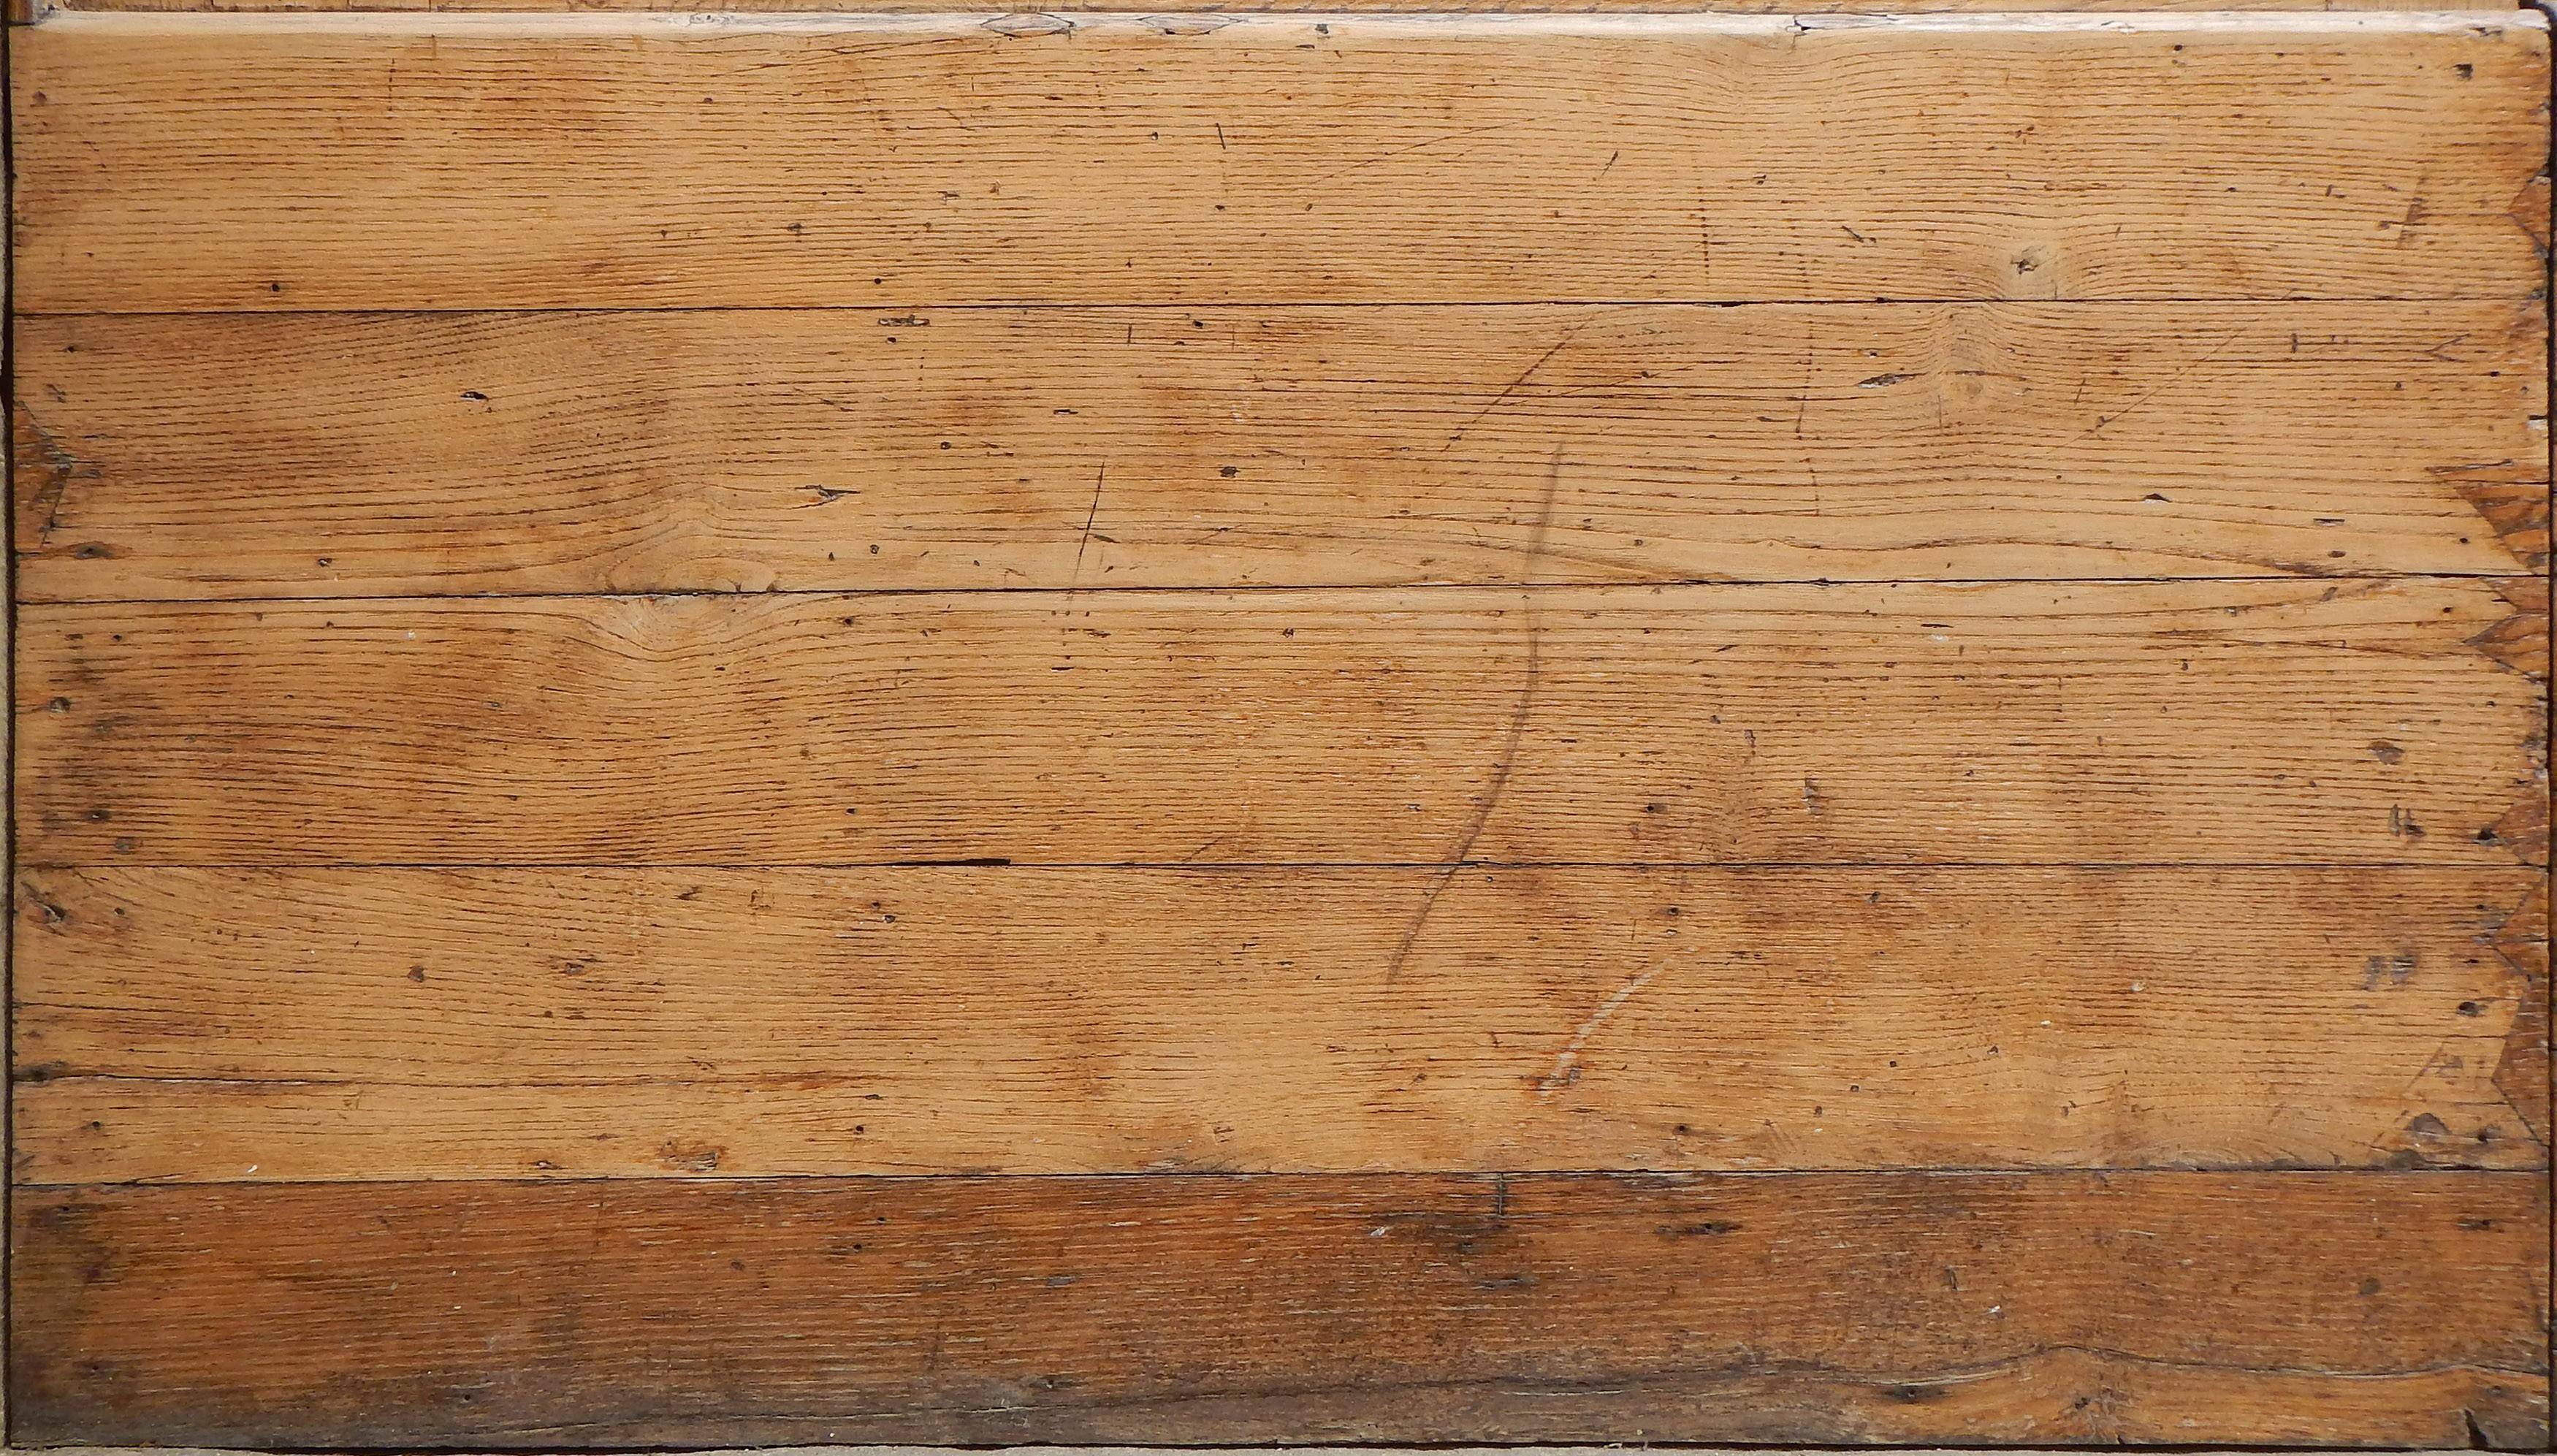 Rustic Barn Wood Background 183 Download Free Beautiful